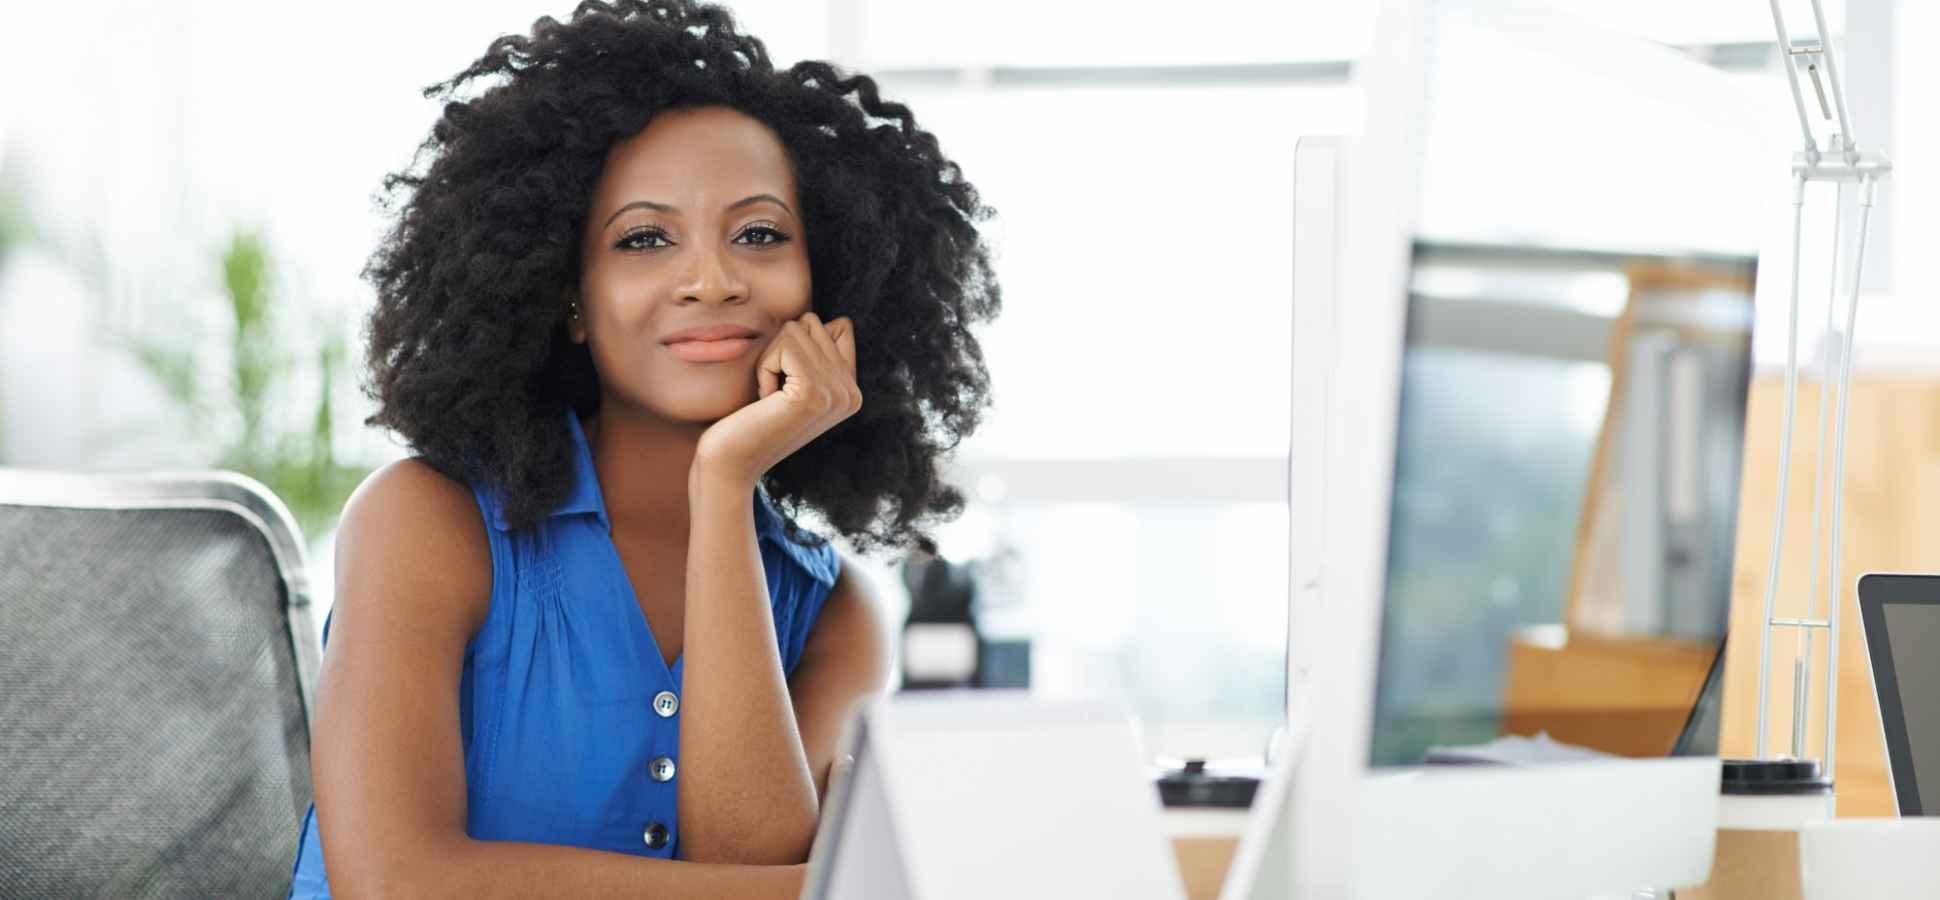 48 Women Empowering Other Women